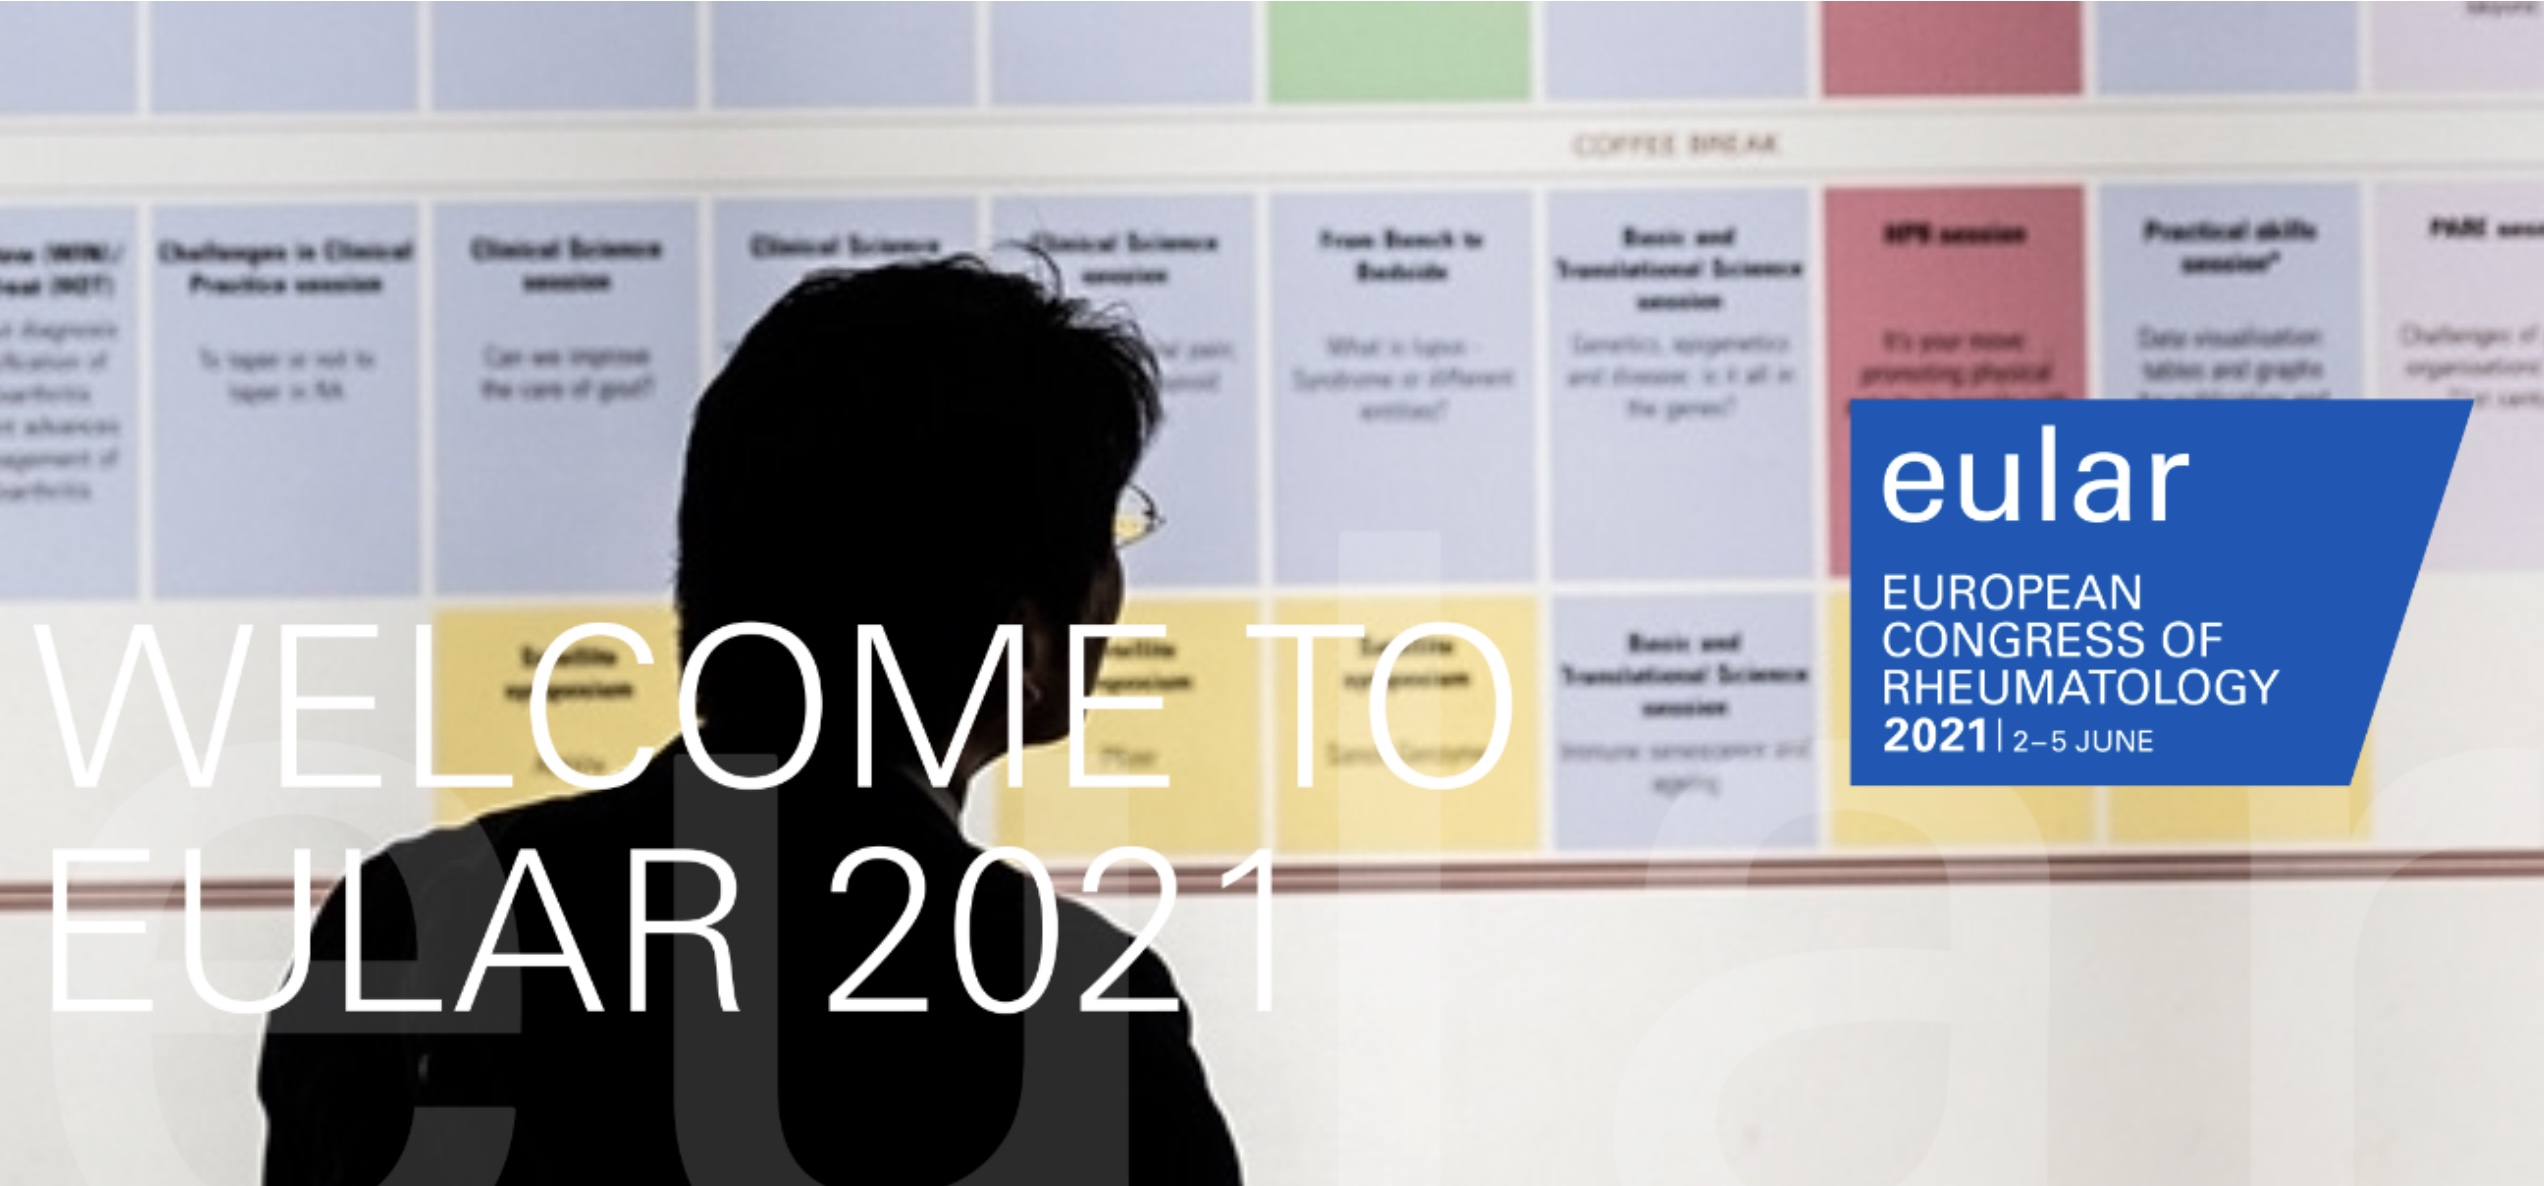 eular 2021